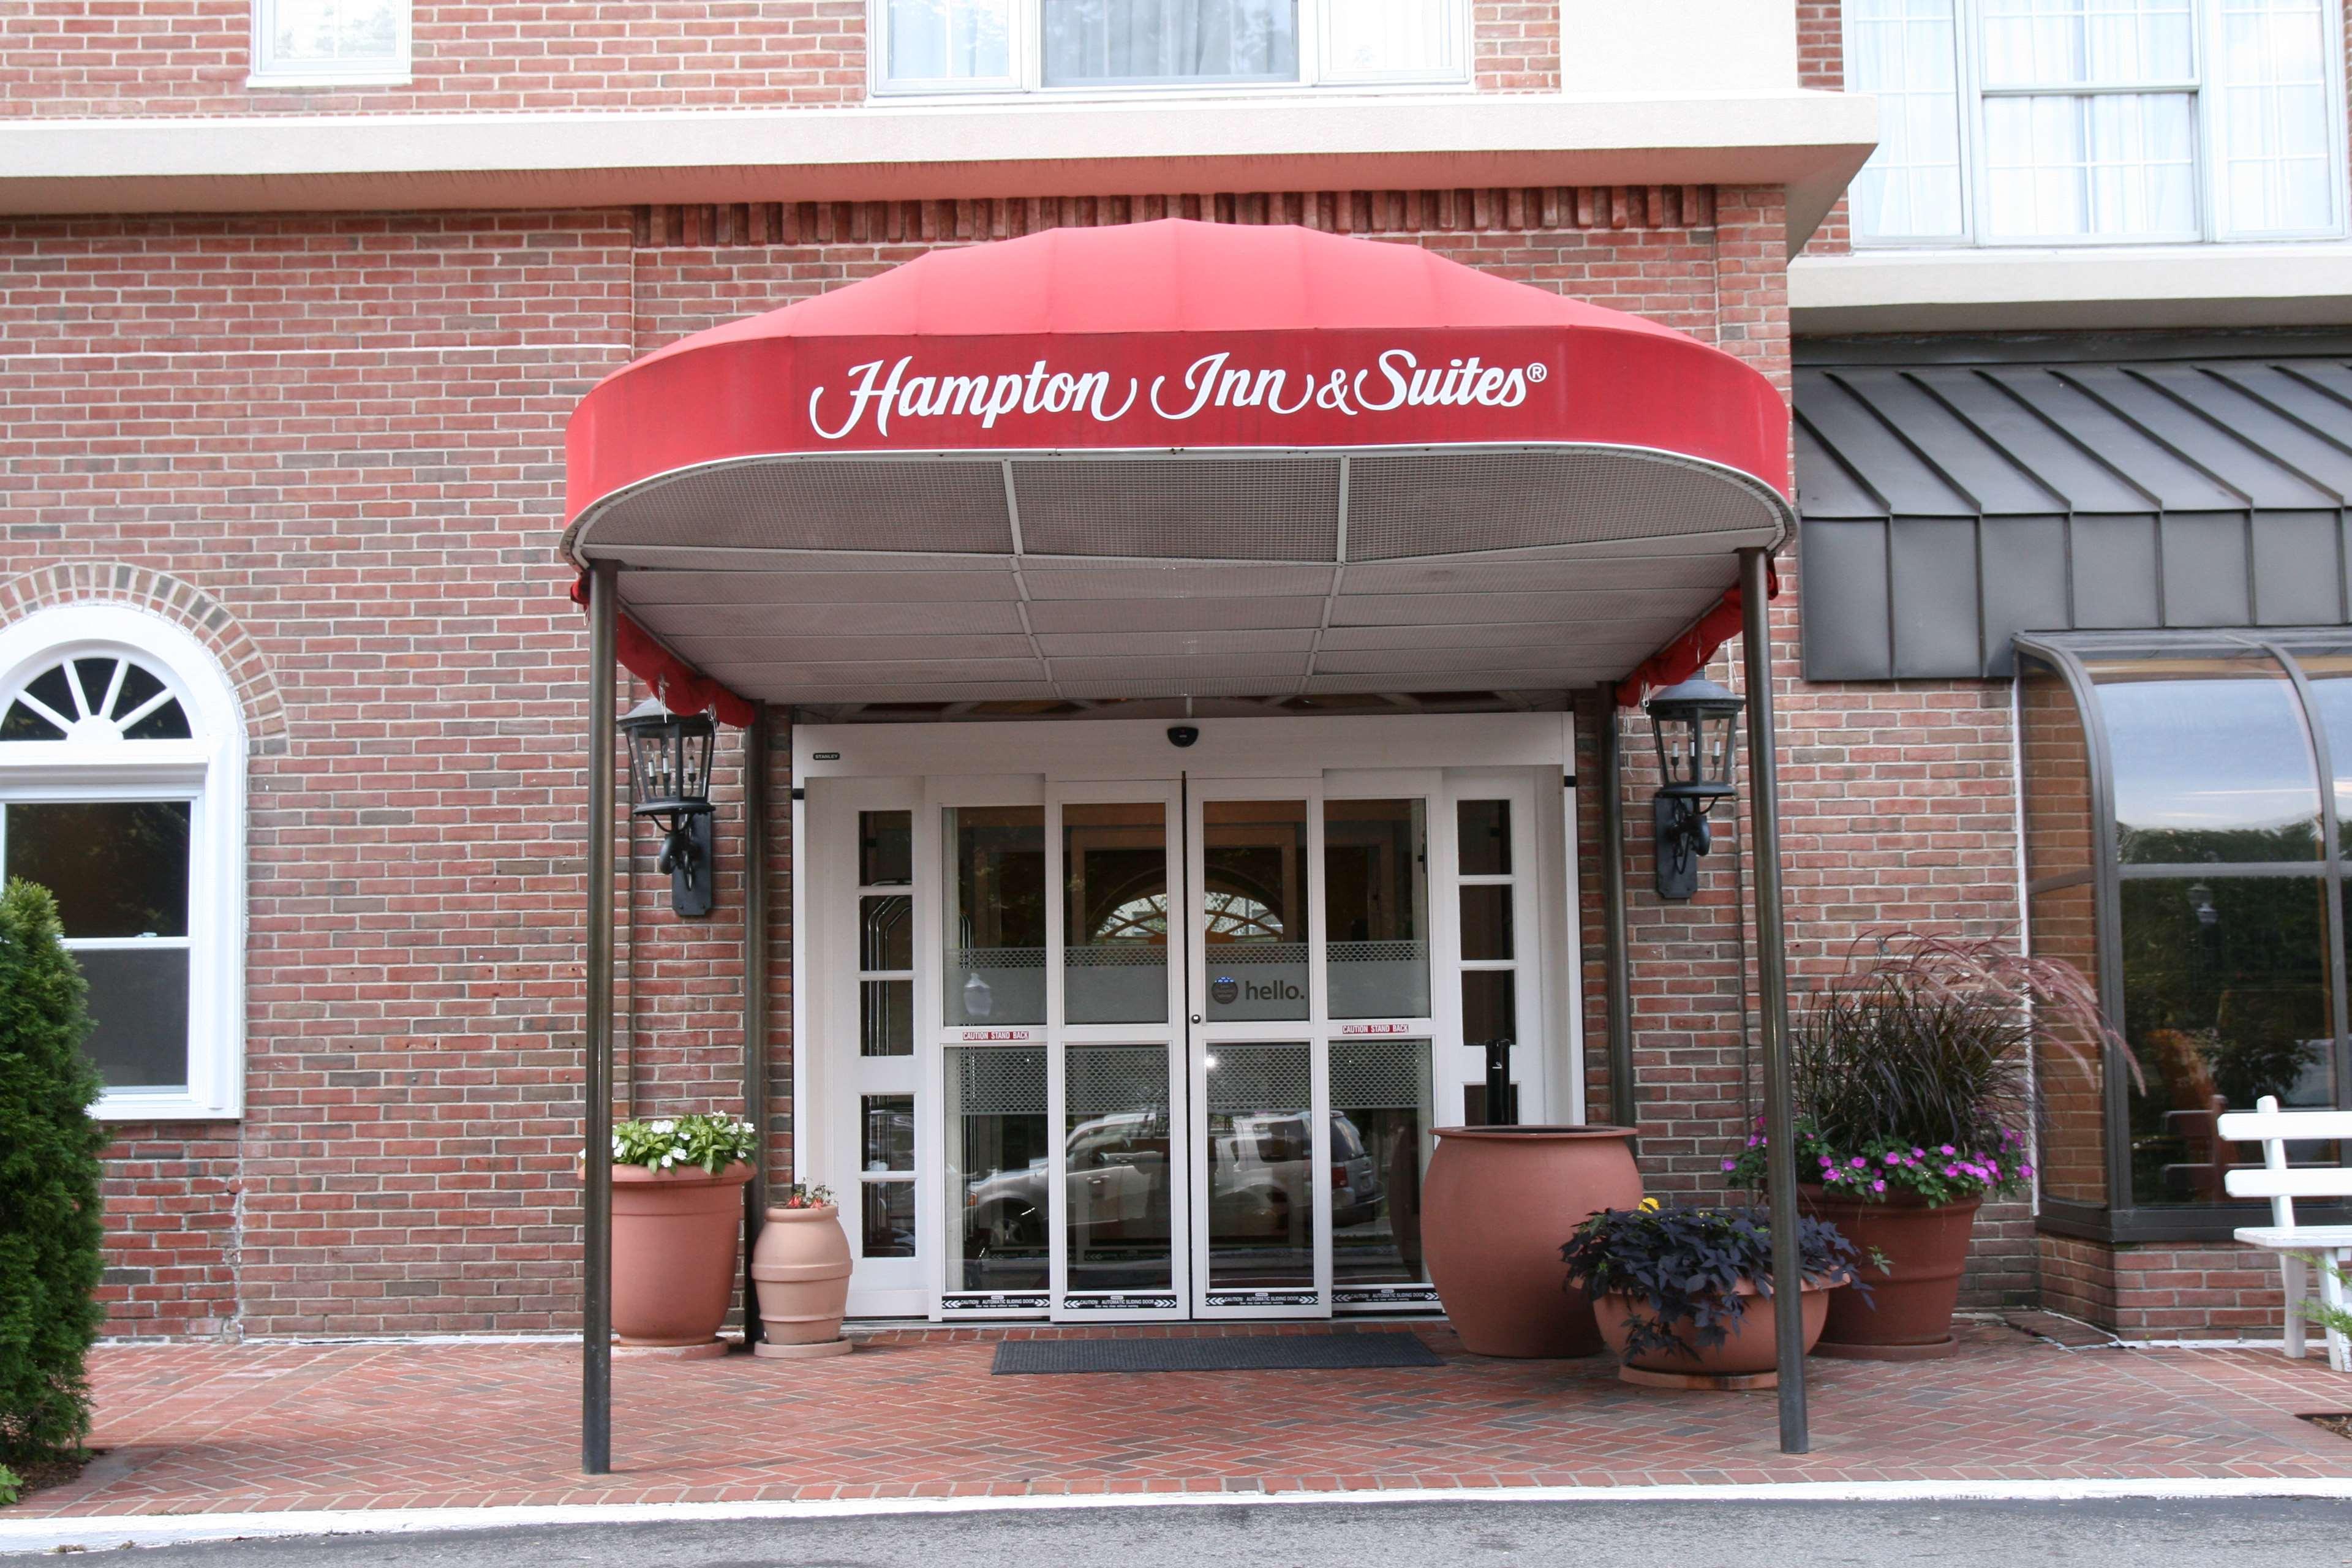 Hampton Inn & Suites Stamford image 3